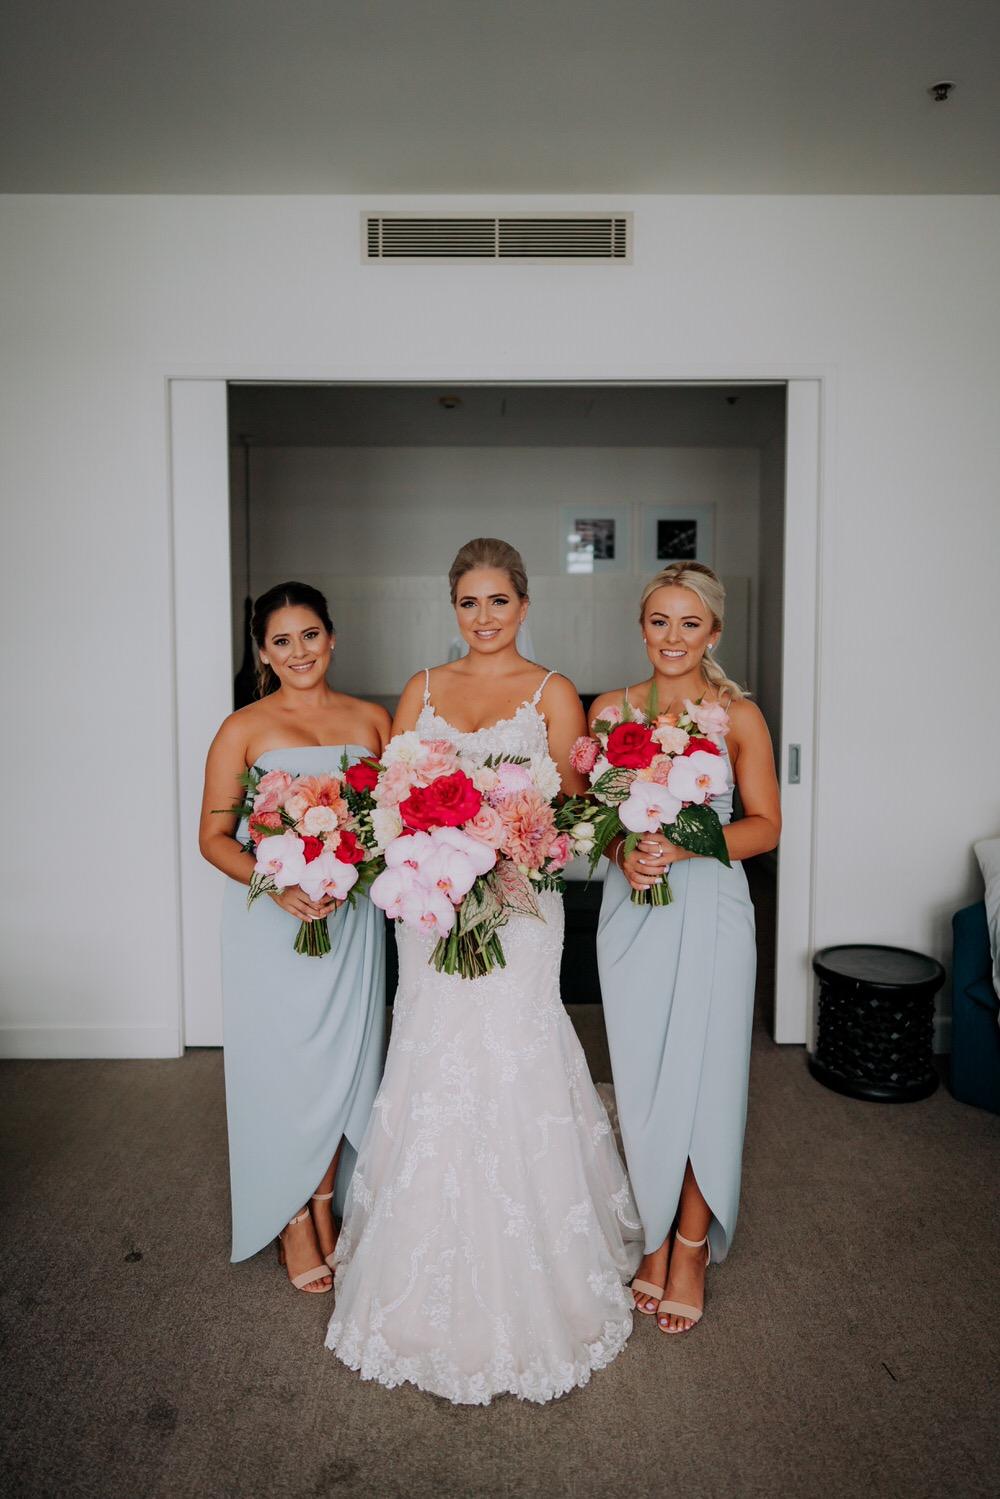 ava-me-photography-gemma-brent-zest-point-piper-sydney-wedding-216